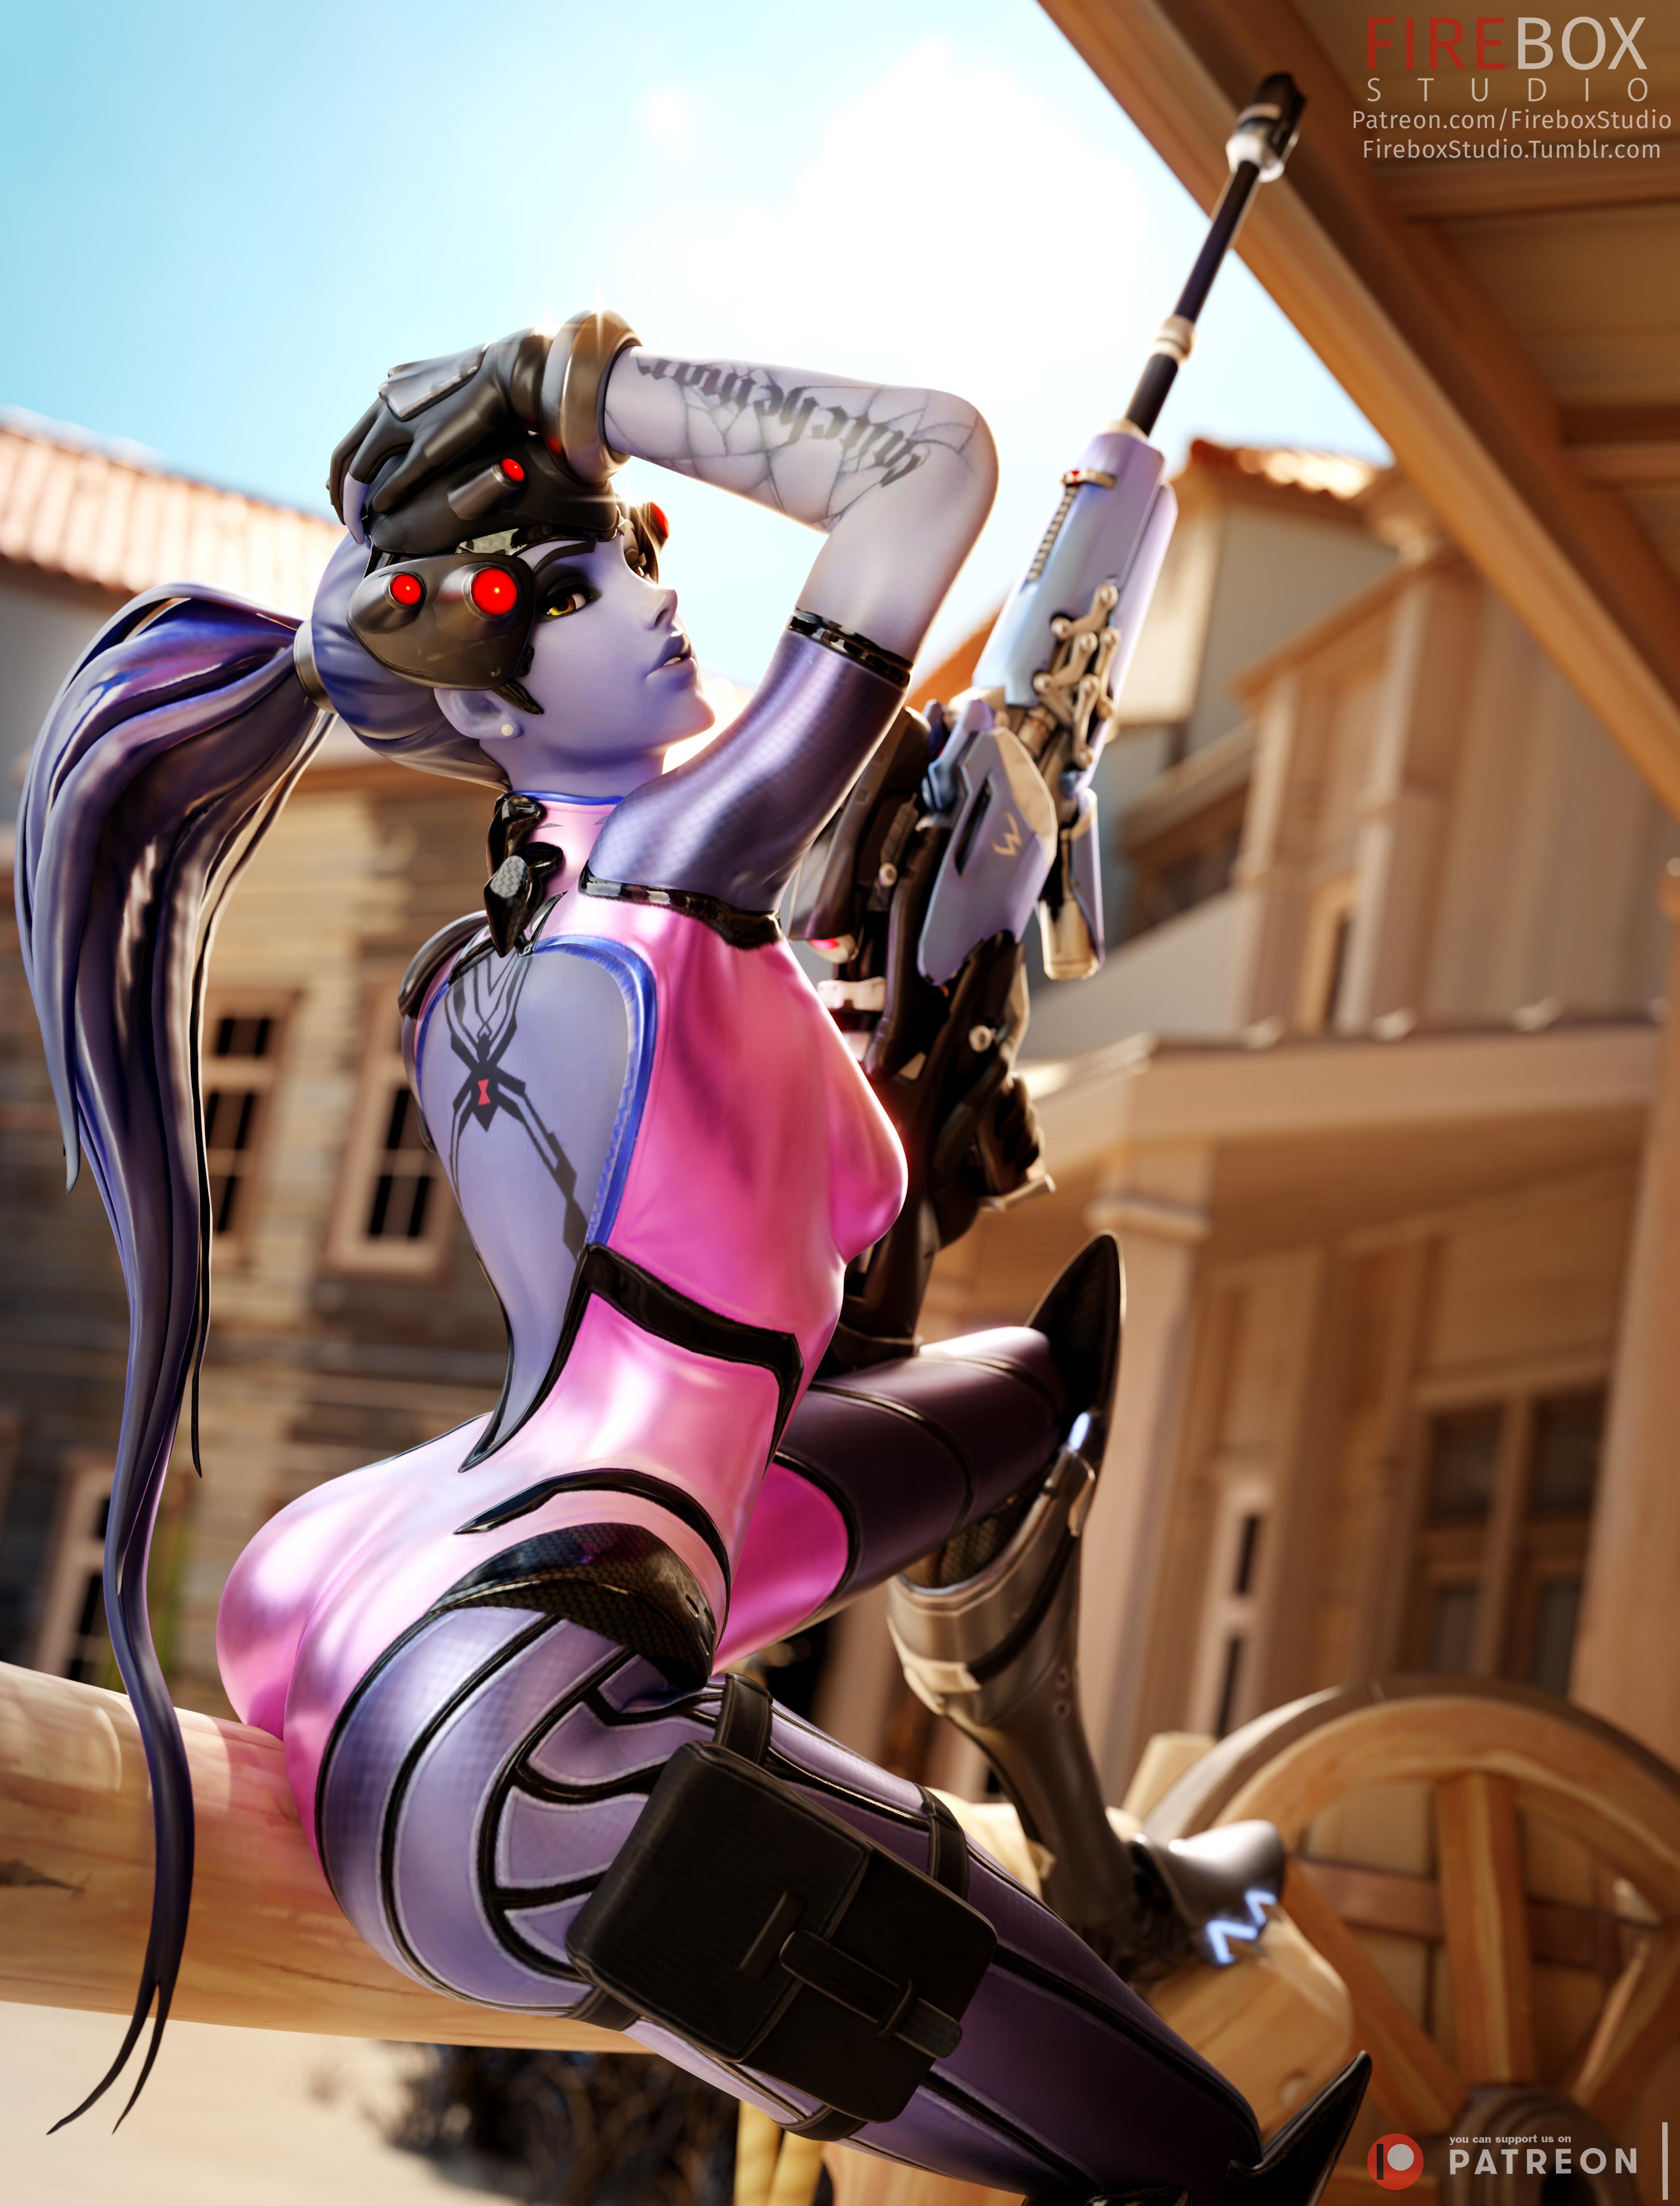 General 2924x3840 video games video game girls video game characters fantasy girl illustration artwork 3D Overwatch Widowmaker (Overwatch) Firebox Studio